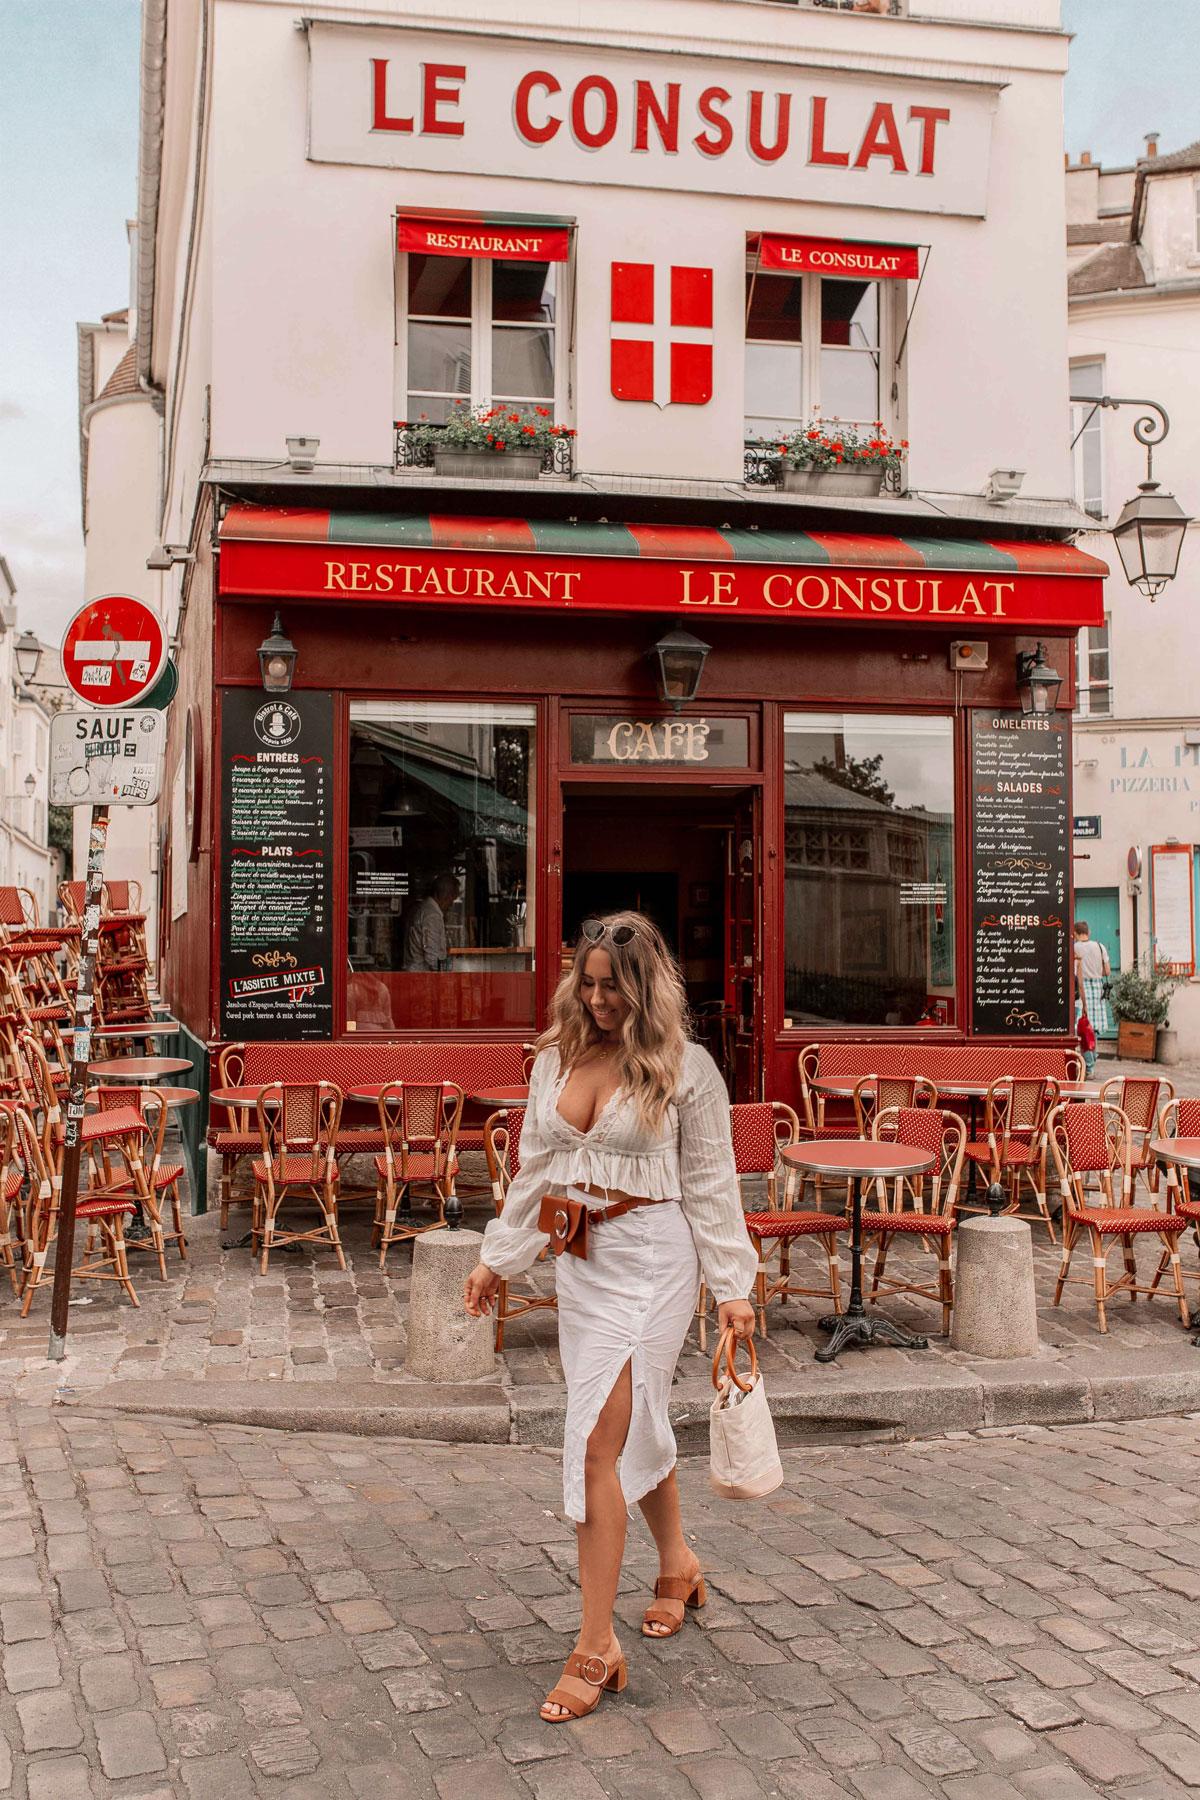 20-Best-Paris-Photography-Locations-Instagram-Spots-Pink-Mamma-@kelseyinlondon-Kelsey-Heinrichs--Le-Consulat-Restaurant